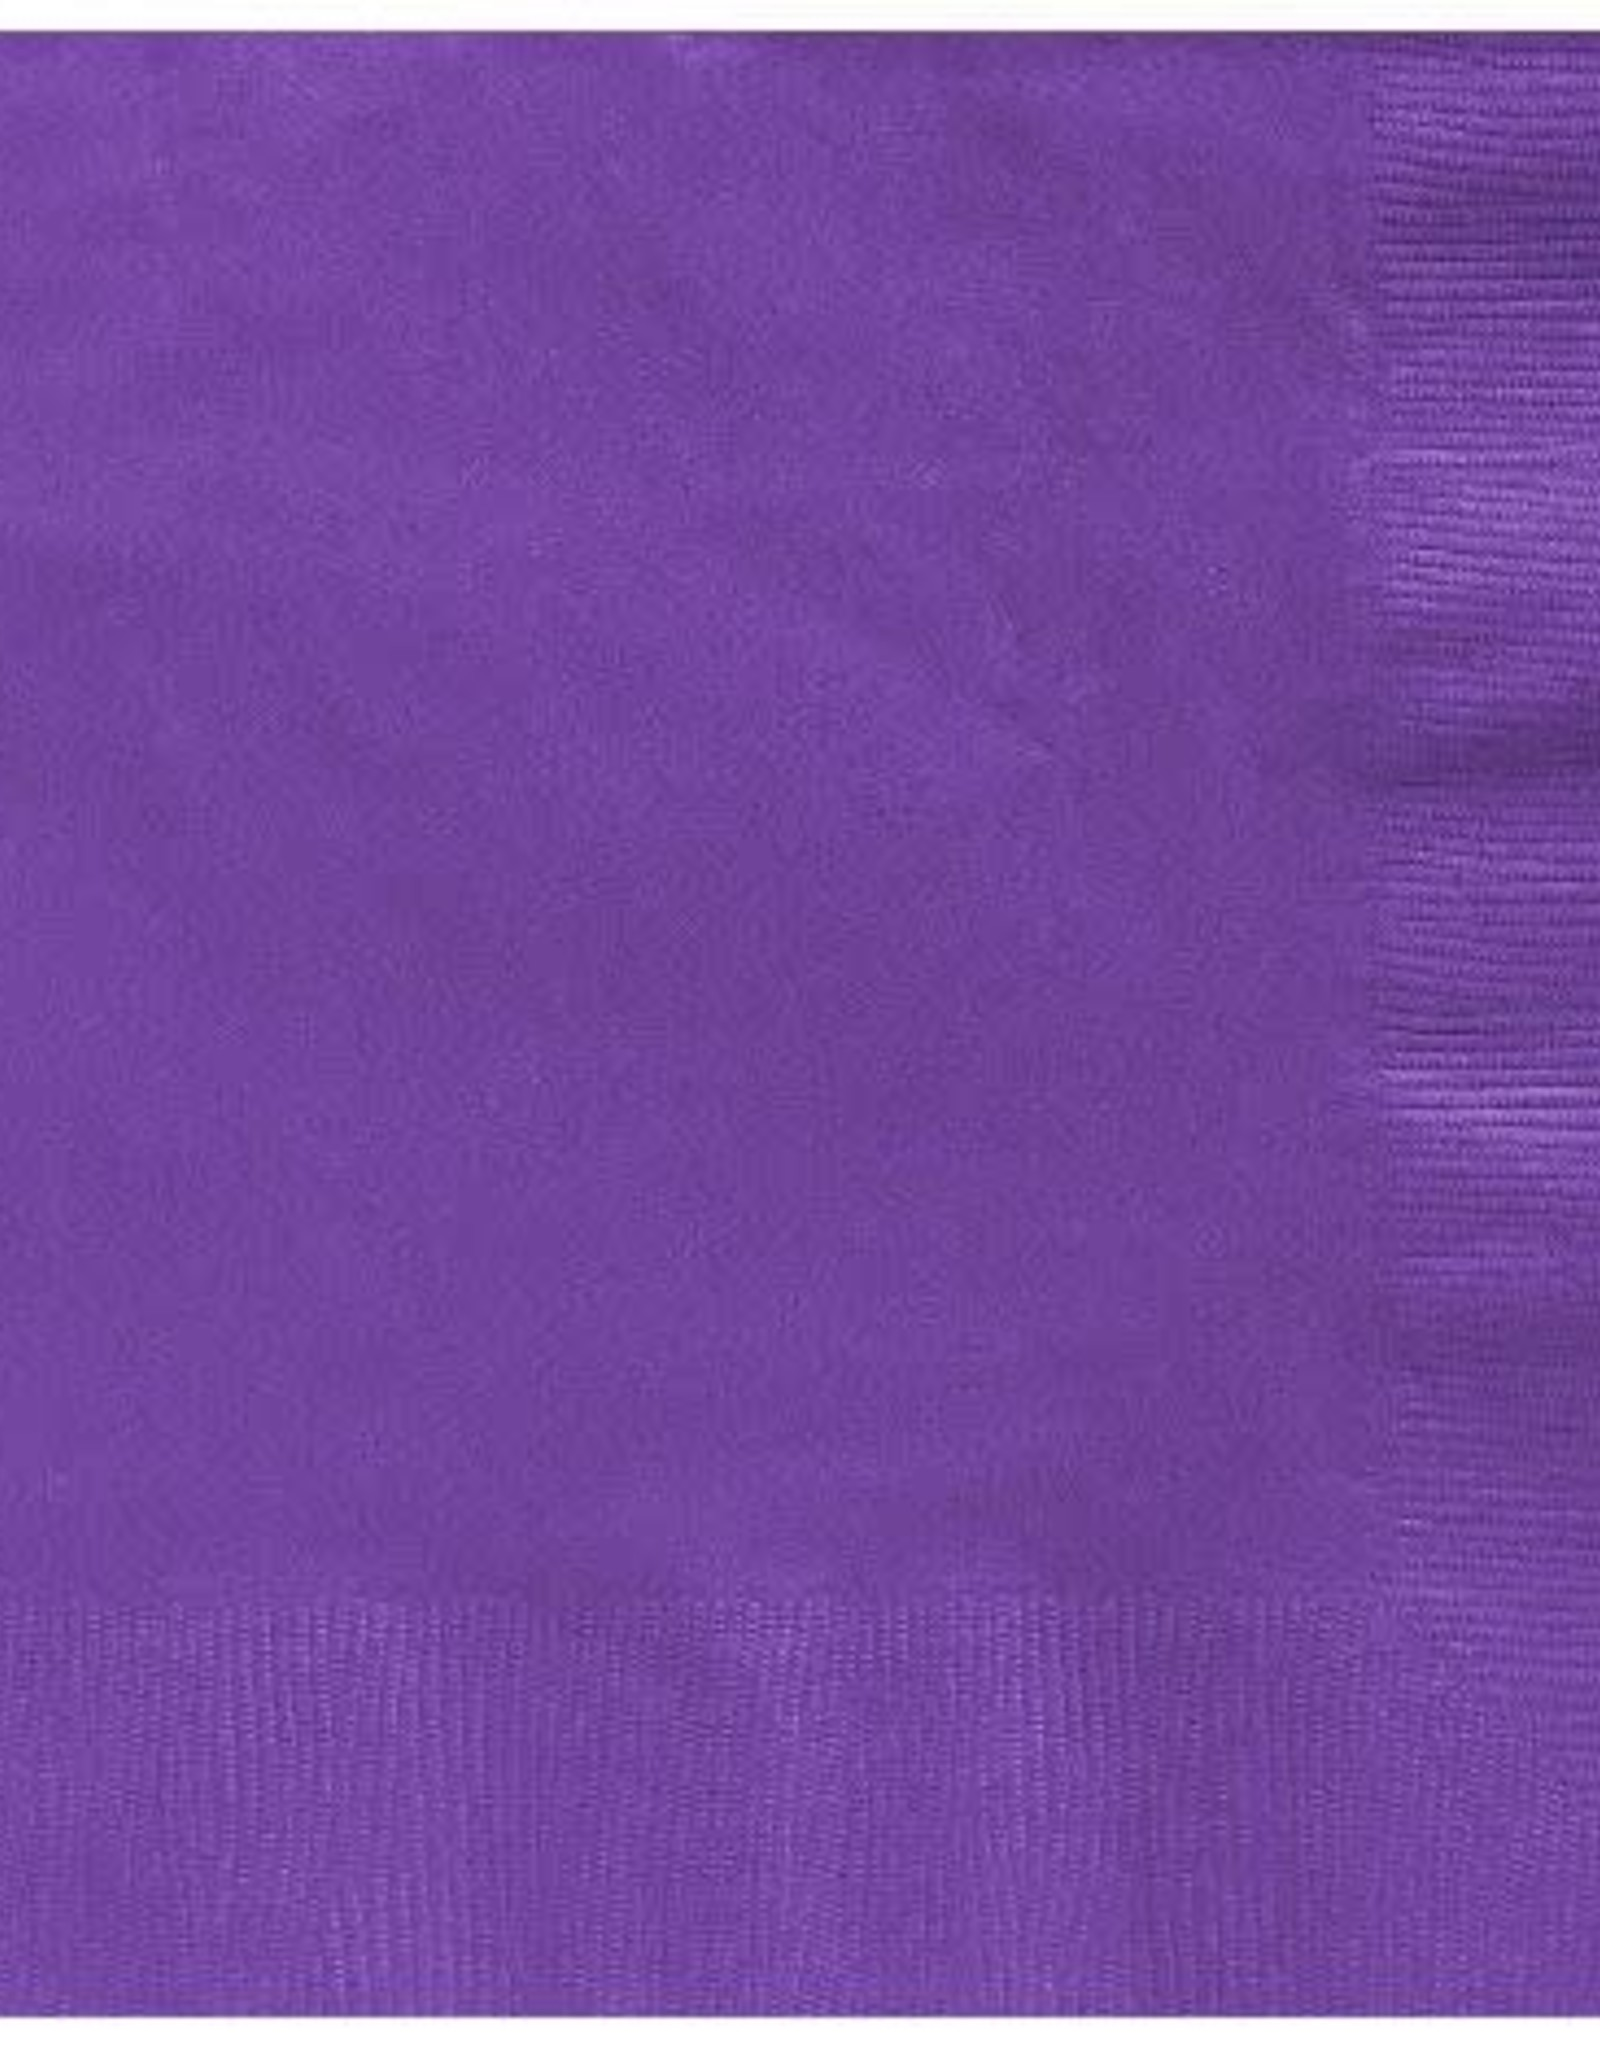 Purple Dinner 2 ply Napkins 50 ct